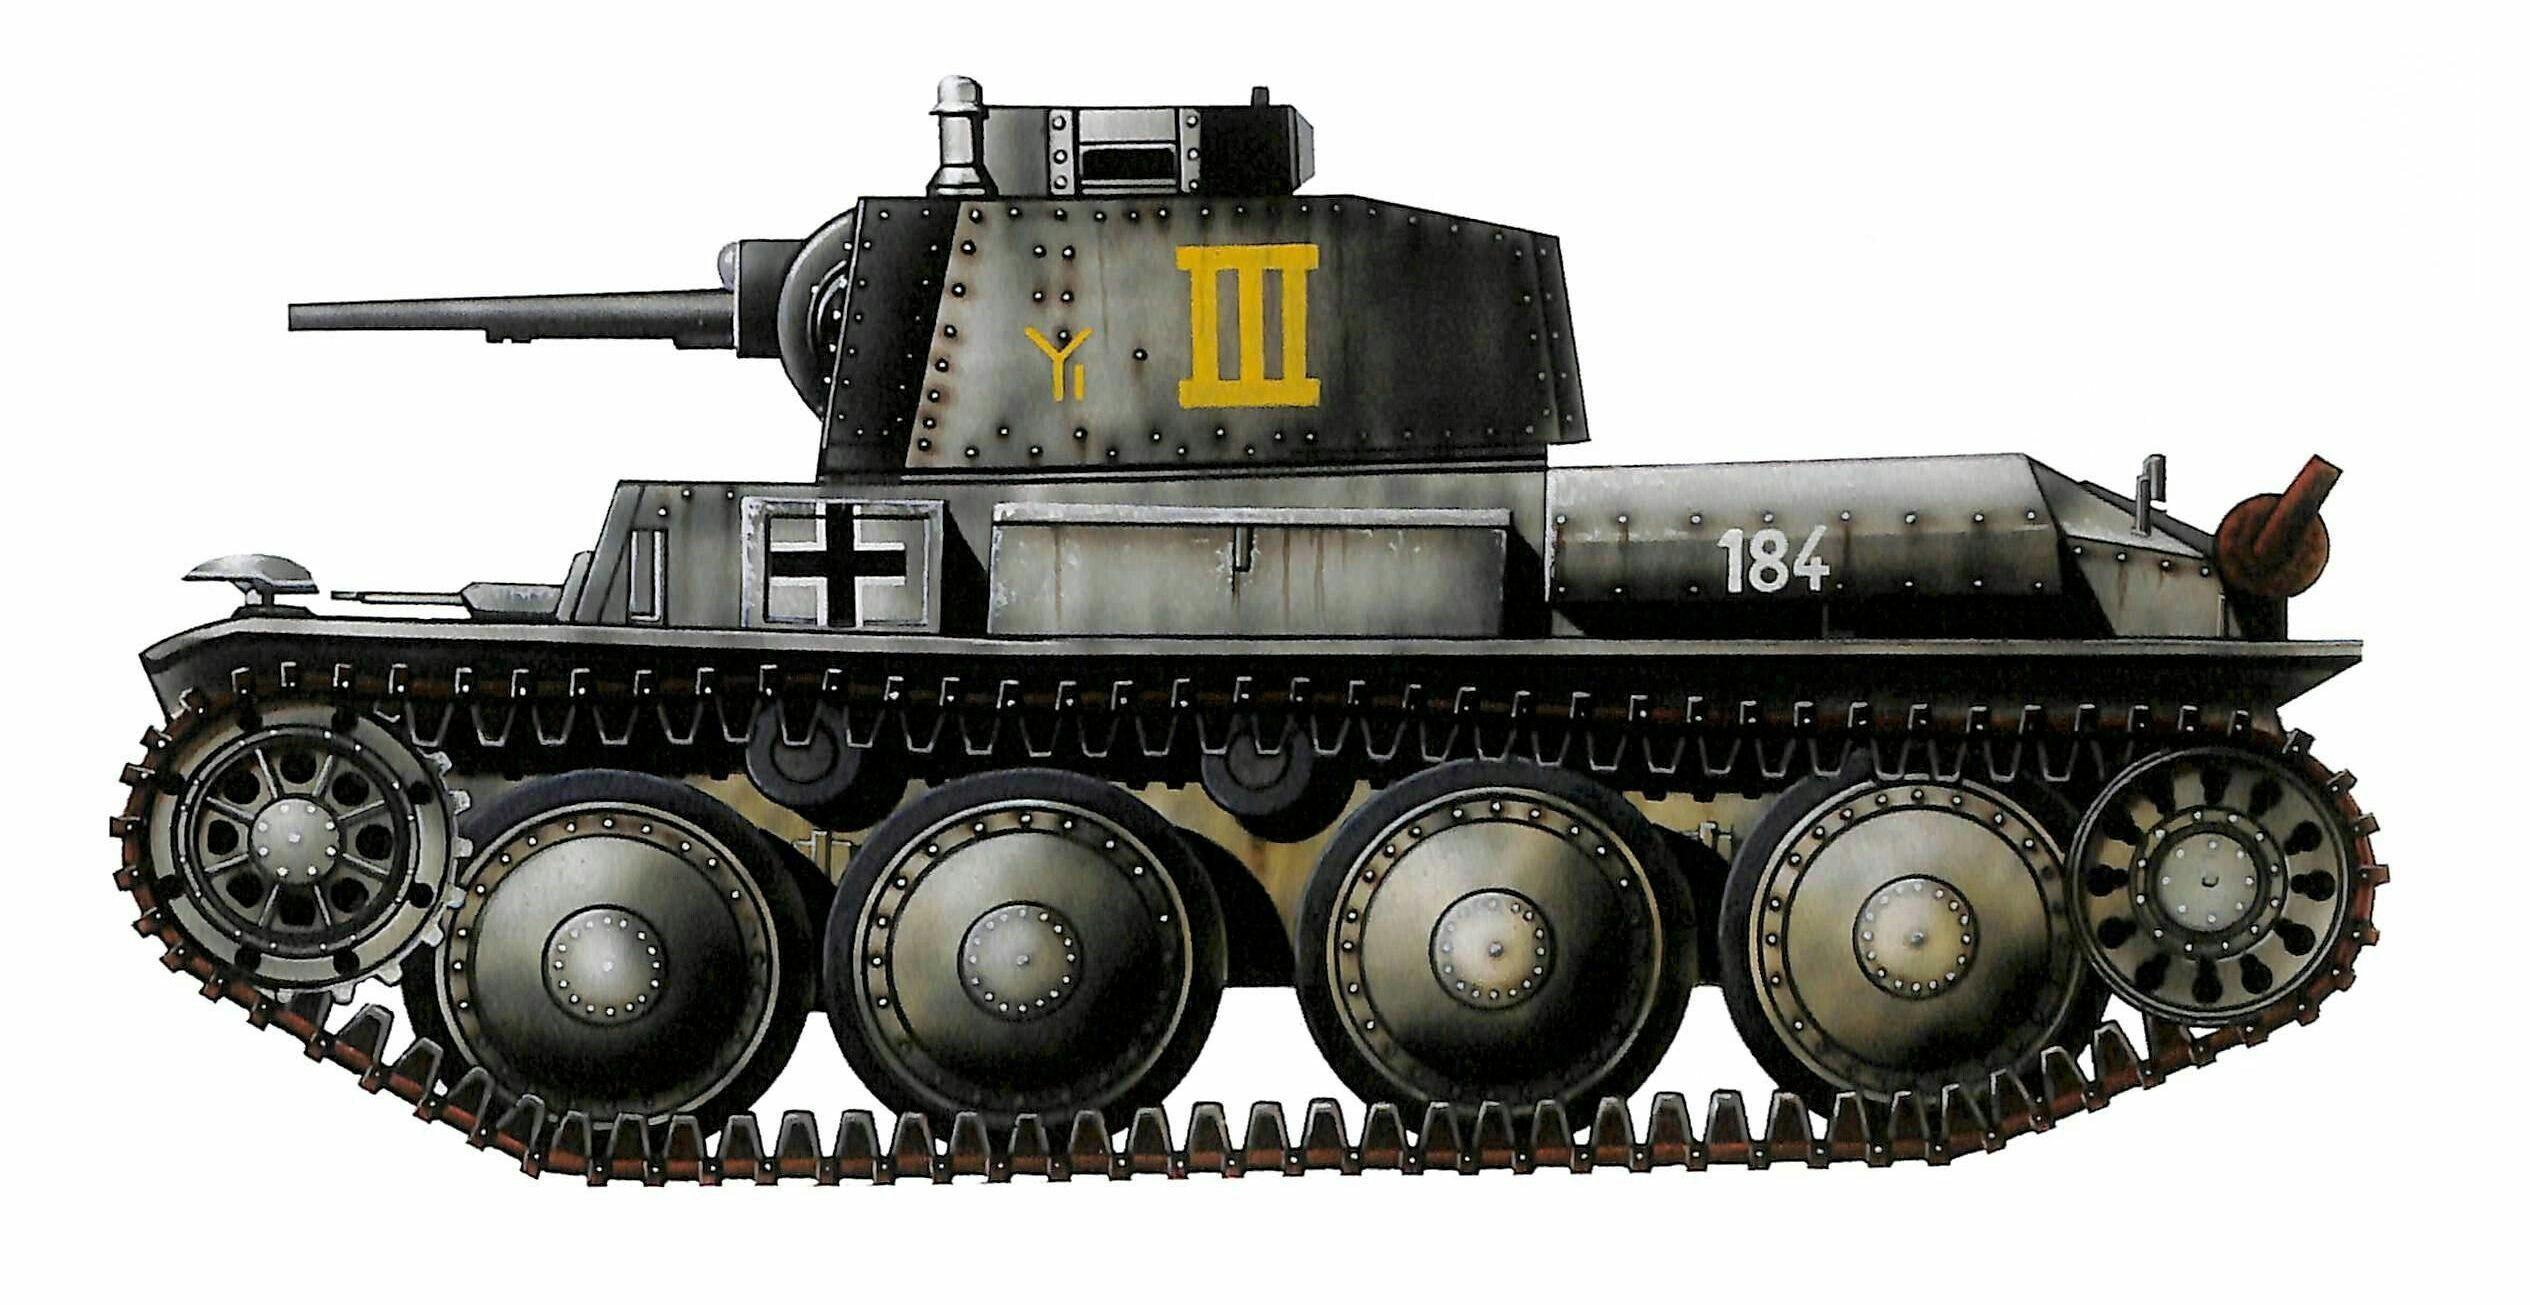 Pin by Ernest Williams on WW2 German Panzers    | Ww2 tanks